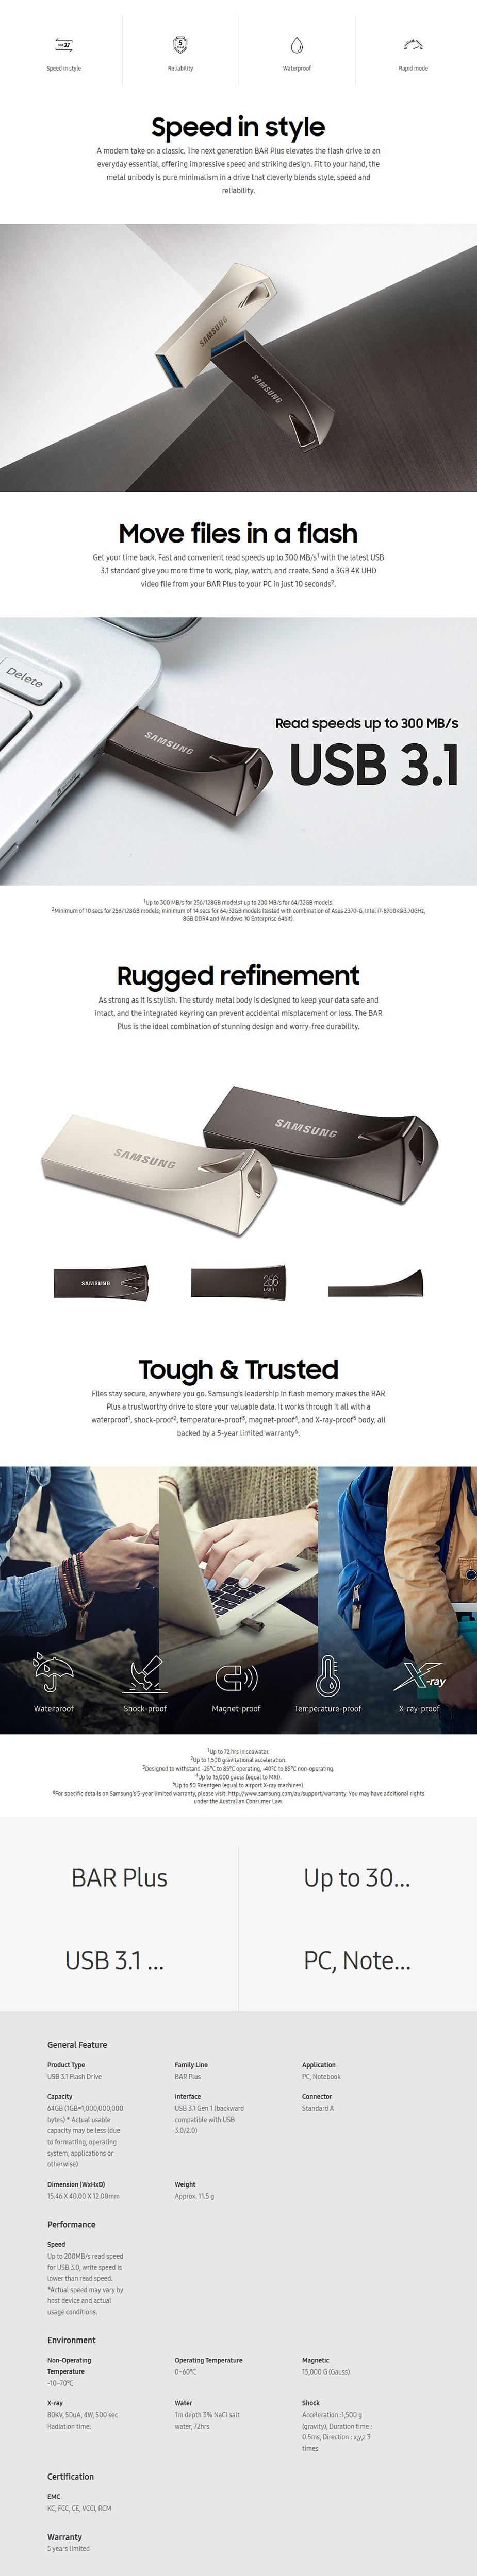 Samsung MUF-64BE4/APC 64GB USB 3.0 BAR Plus Flash Drive - Titan Gray - Desktop Overview 1